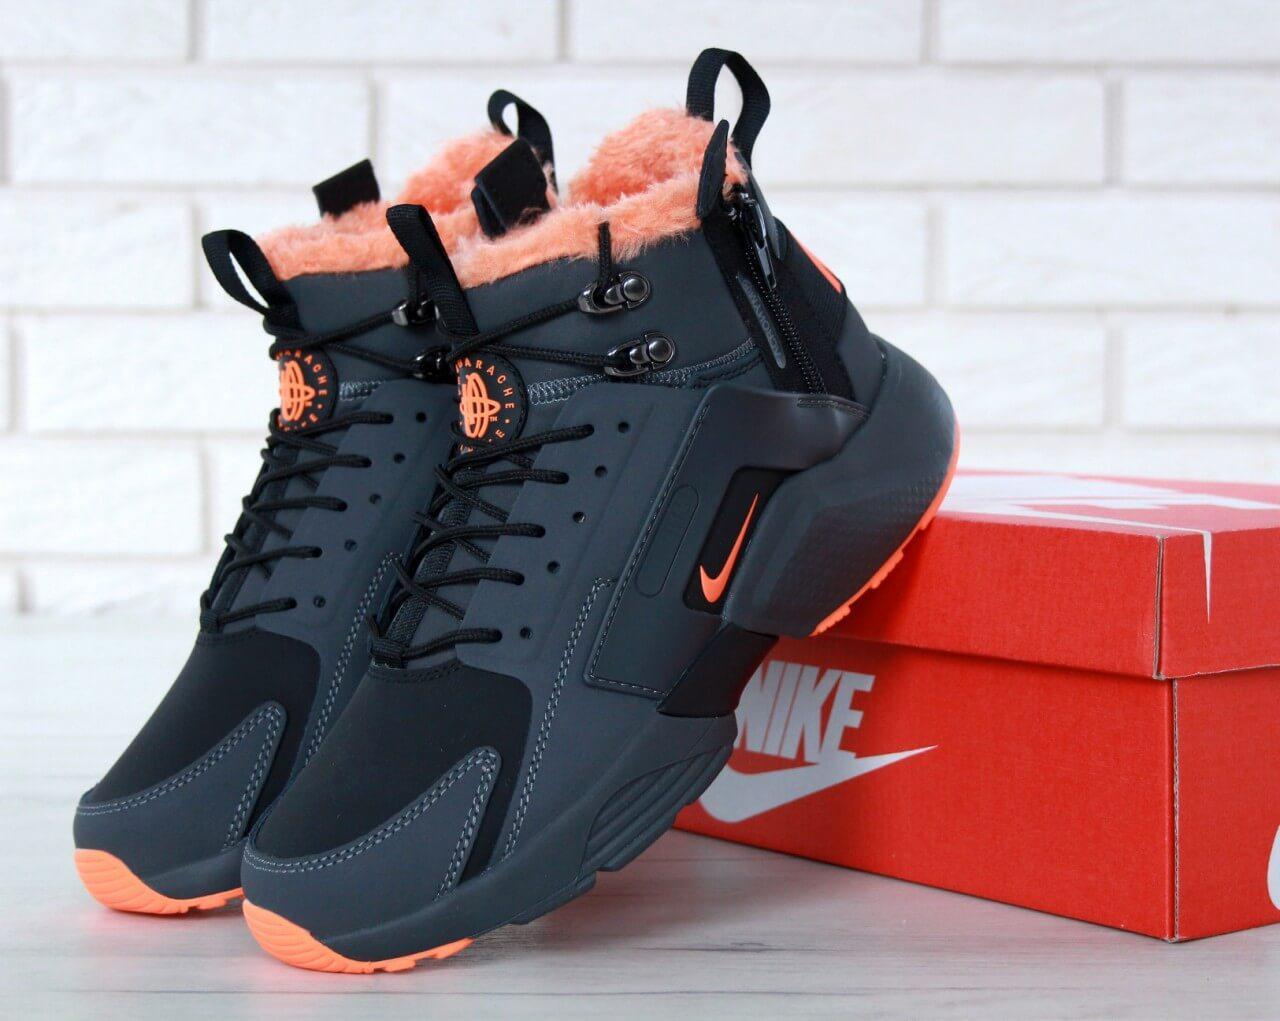 8c17130b Кроссовки с мехом Nike Huarache X Acronym City Winter Grey Orange ...